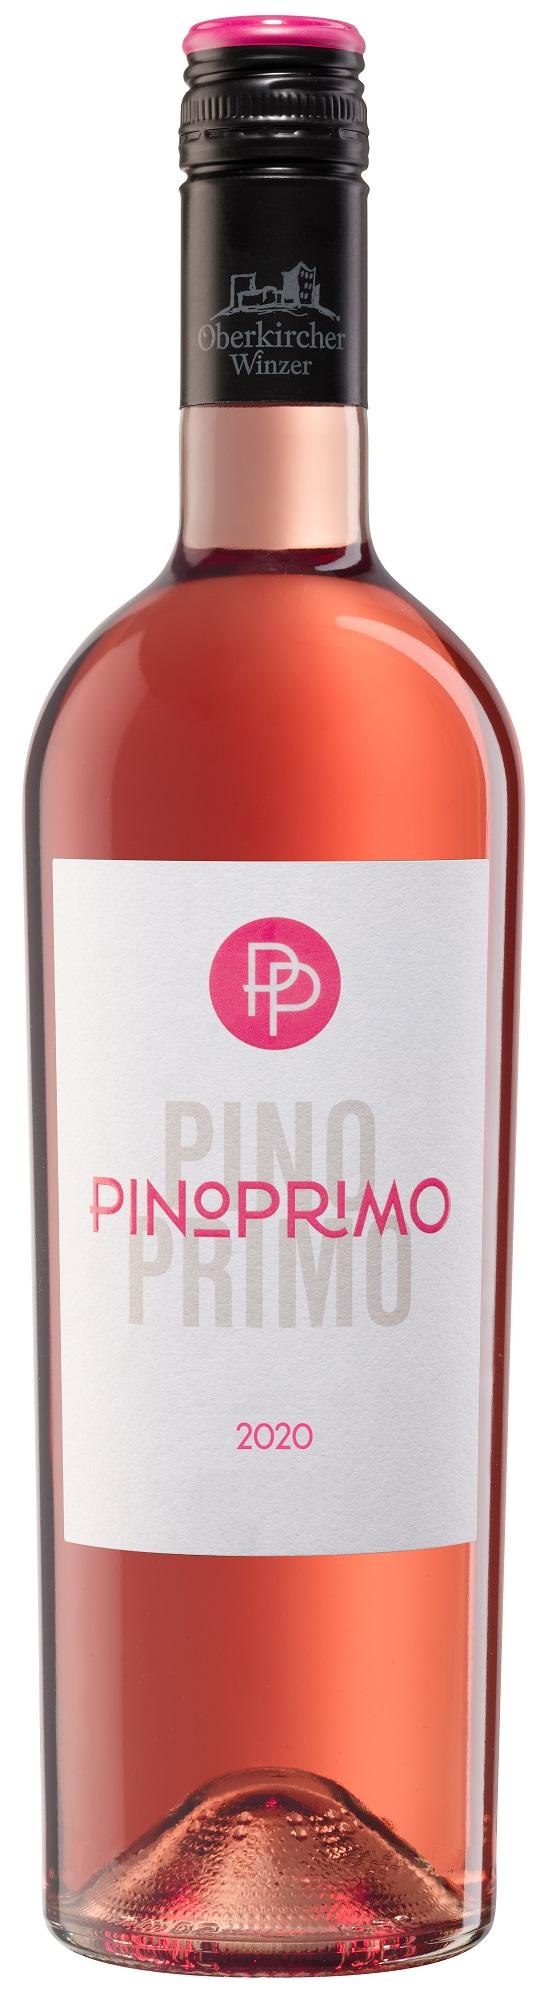 PinoPrimo , Cuvée rosé